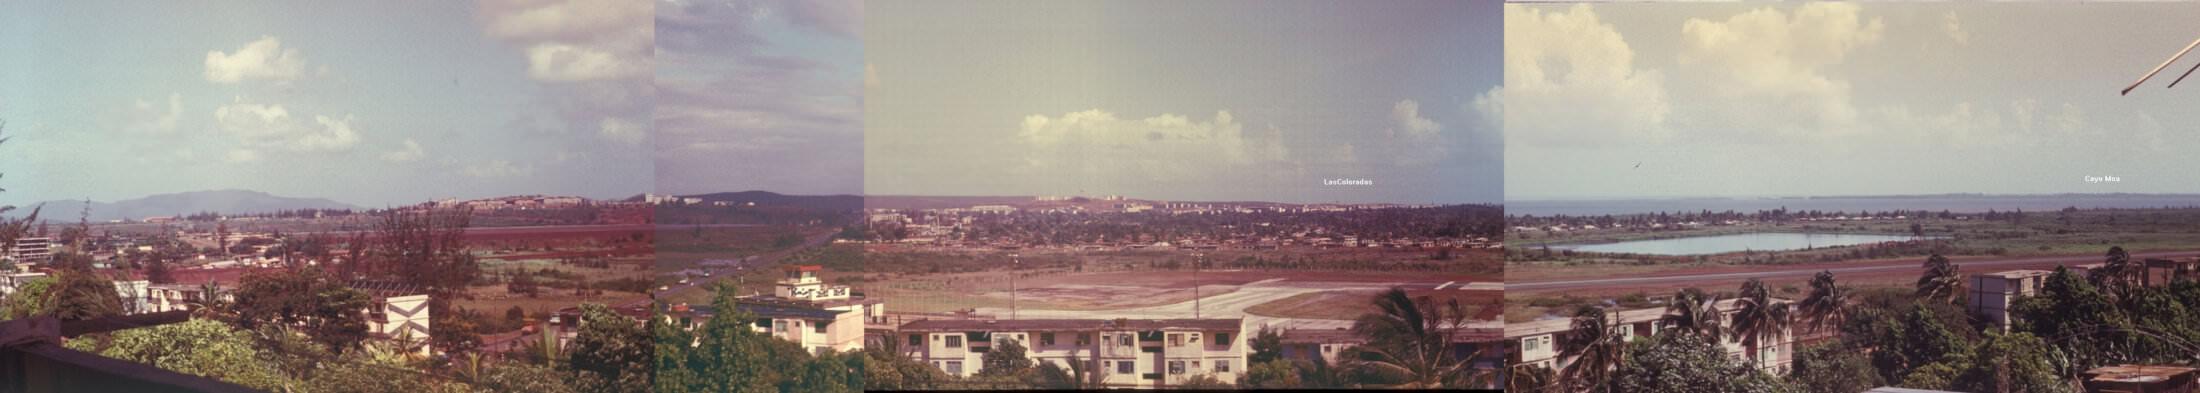 Обзорная панорама на Моа. Вид с балкона 4-го этажа 3-го Роло. 1987